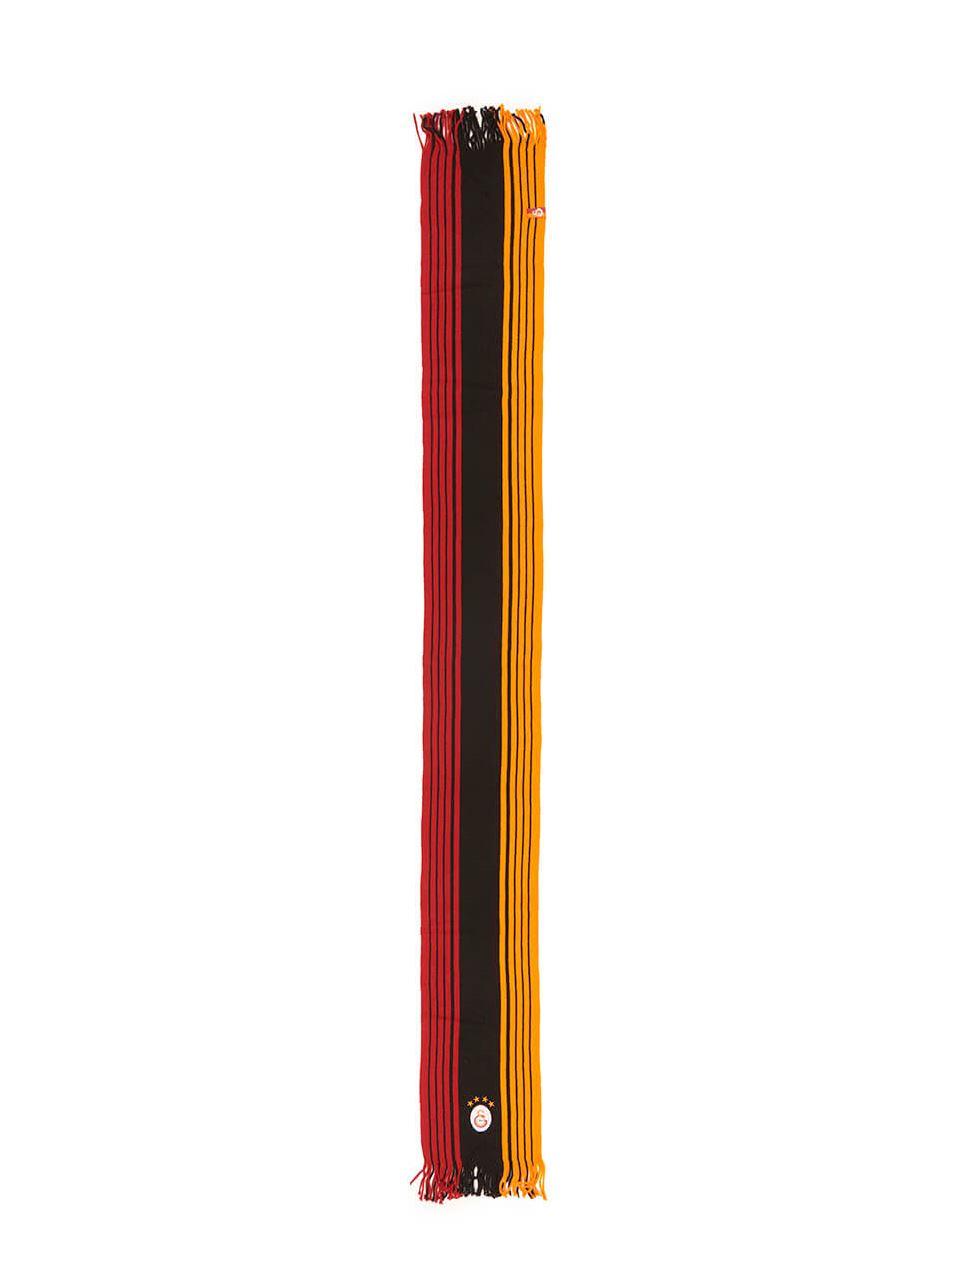 U95259 ATKI